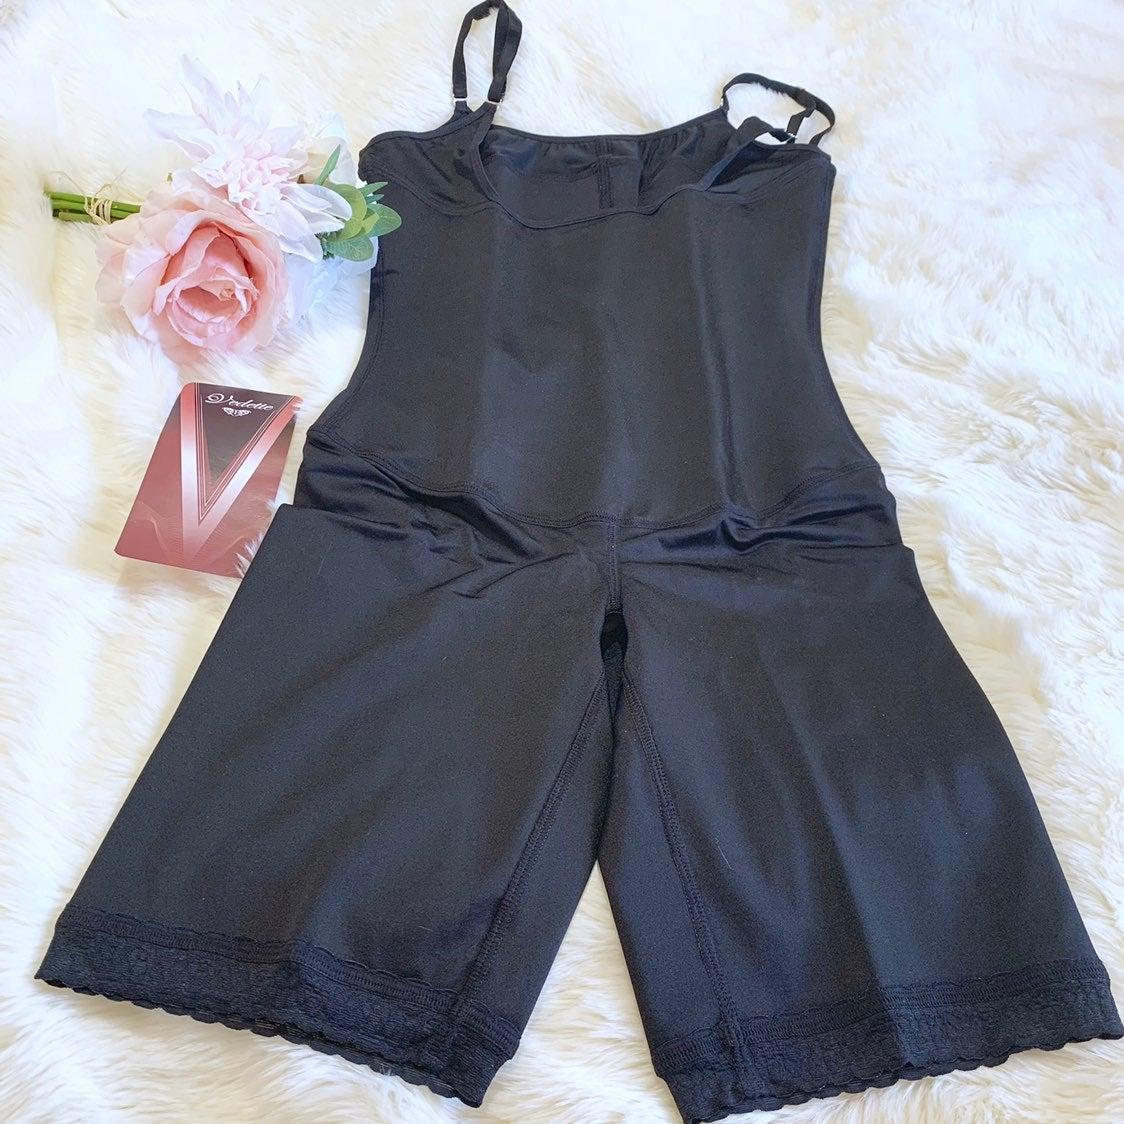 Vedette bodysuit / compression shapewear